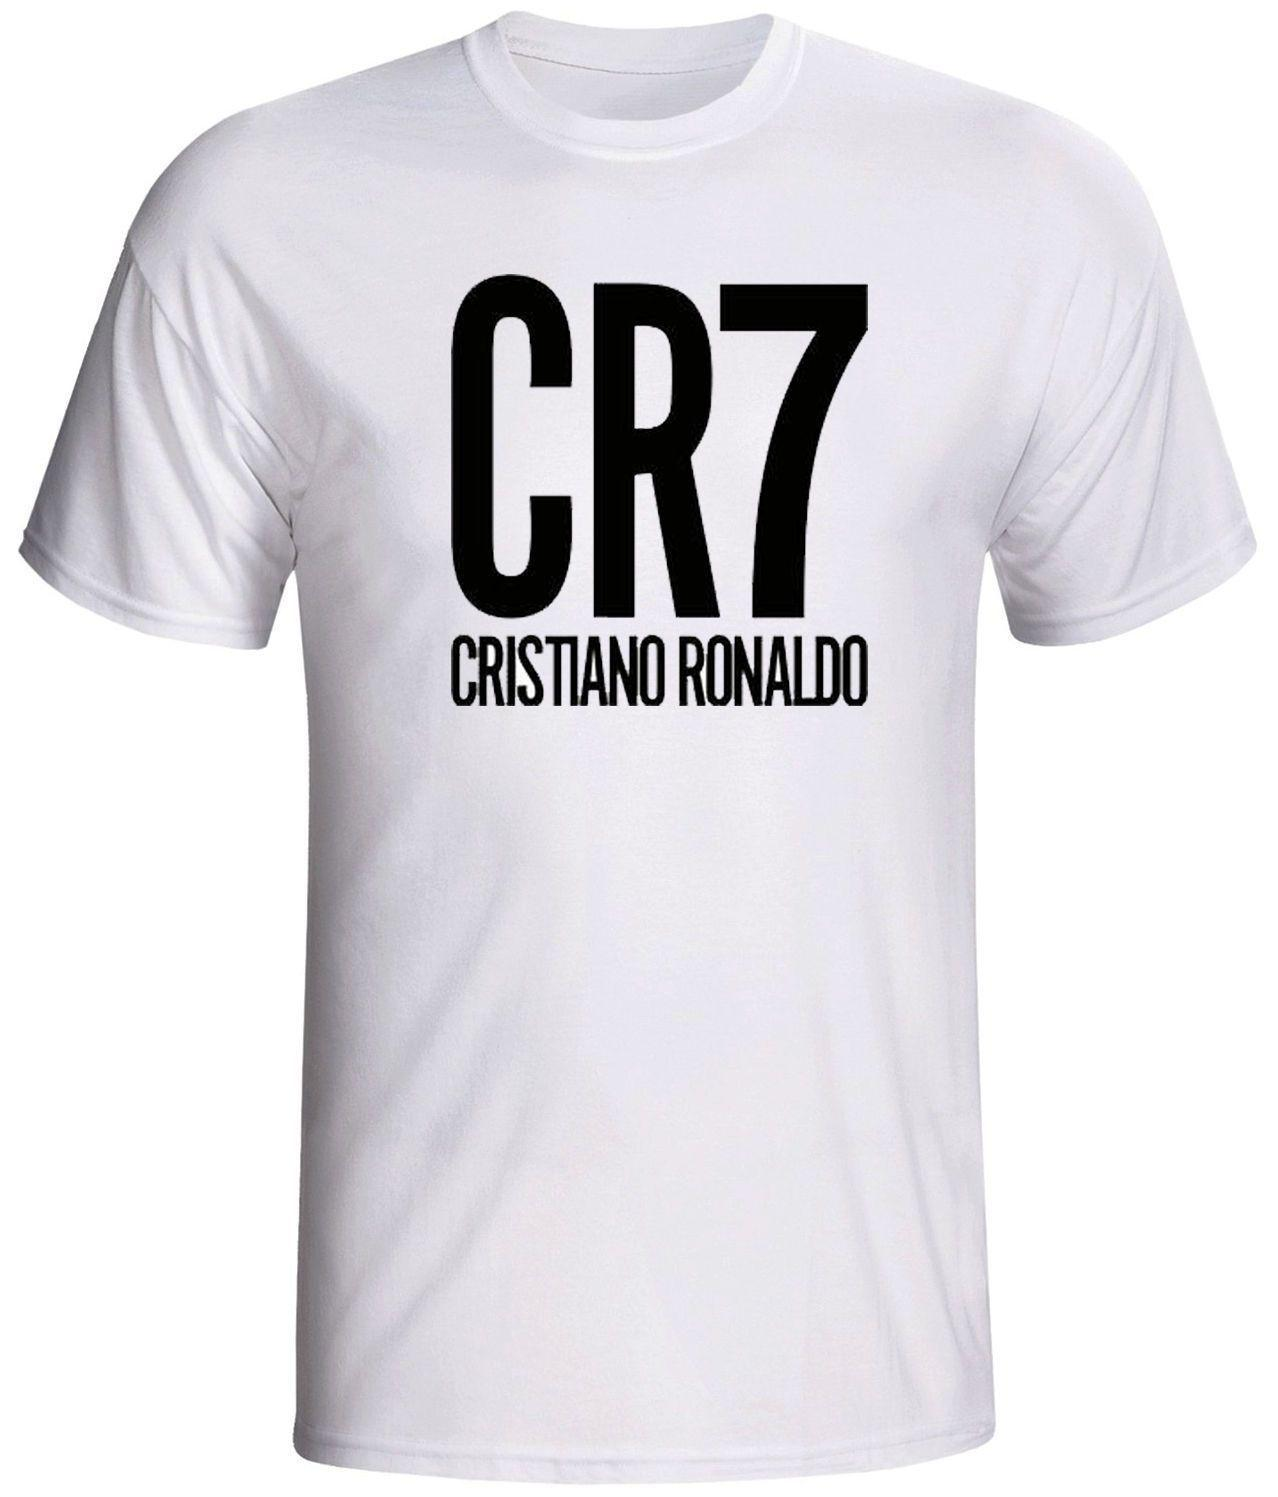 Compre Camisa Cristiano Ronaldo CR7 Fútbol Camiseta Cómoda Camiseta De  Manga Corta Casual 100% Algodón Manga Corta Camiseta Nueva Top Tees A   11.01 Del ... 2089adb48a75d